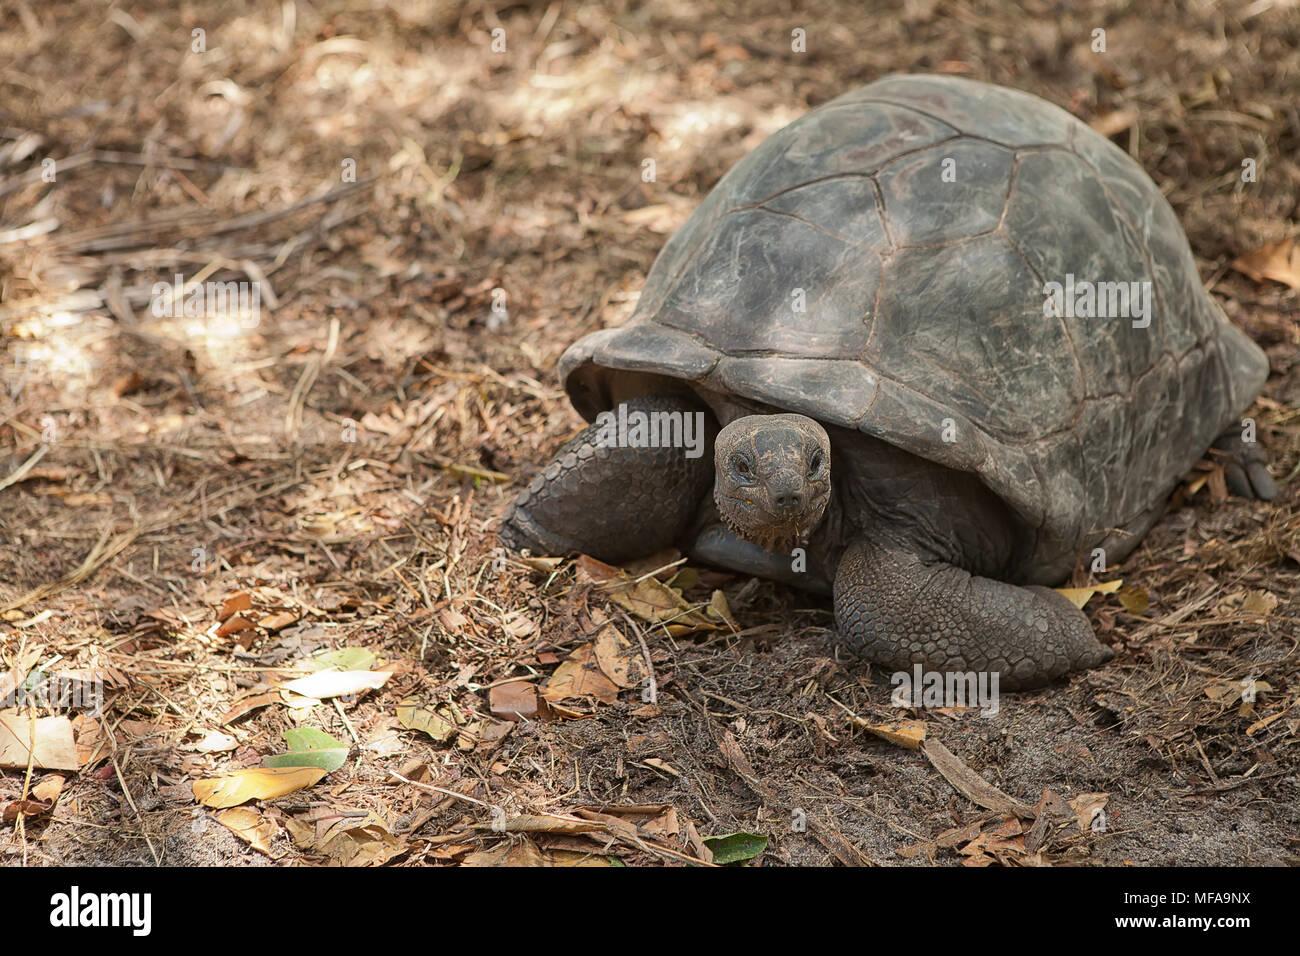 Tortuga Gigante de las Seychelles. La isla de Praslin, Seychelles Foto de stock